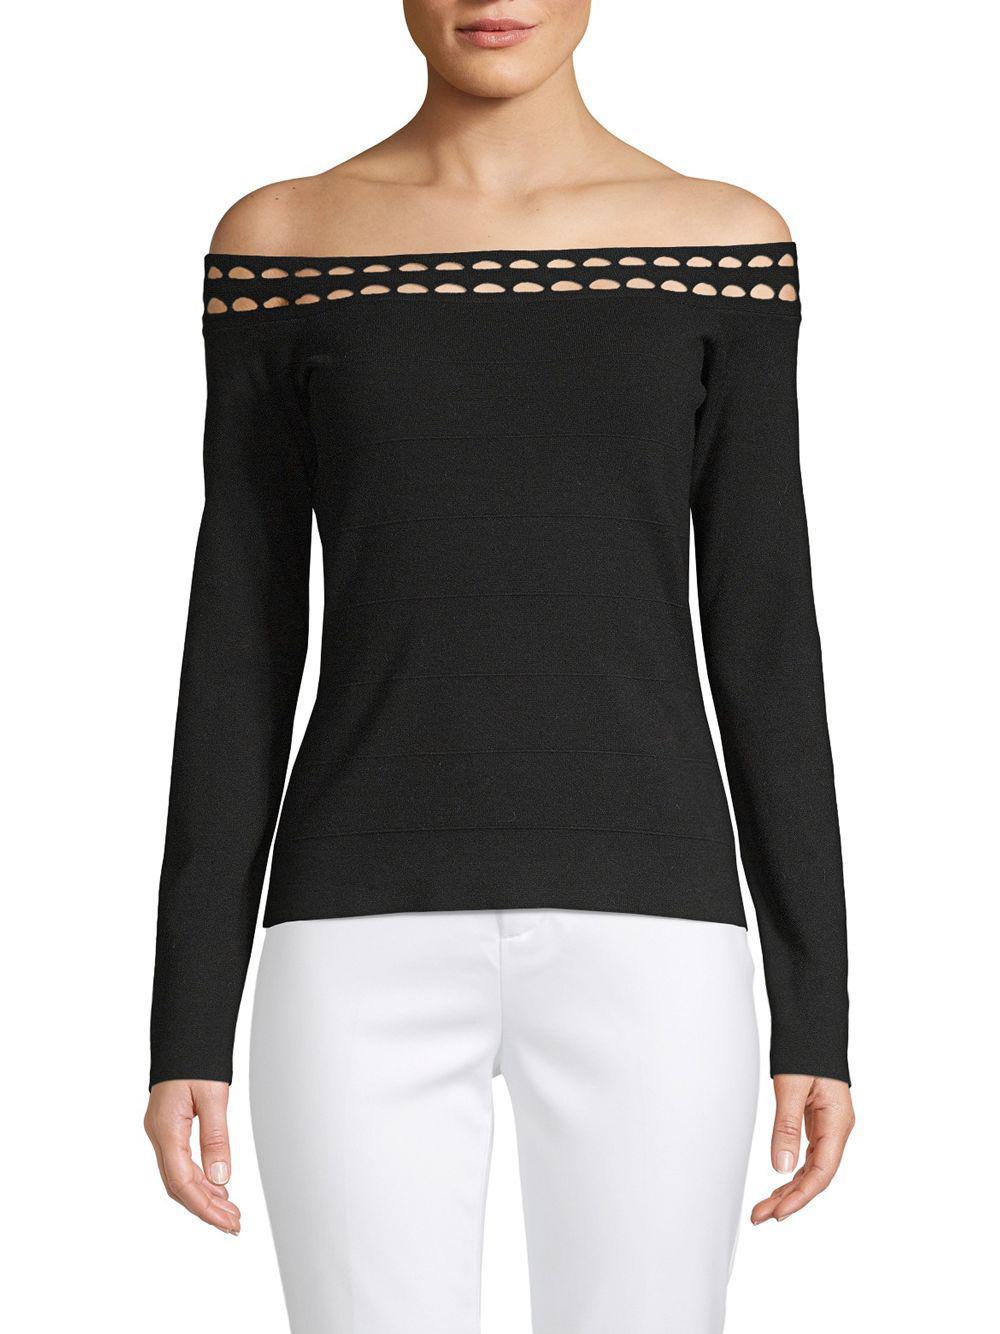 7a26394b520567 Lyst - Elizabeth And James Eniko Cutout Off-the-shoulder Top in Black